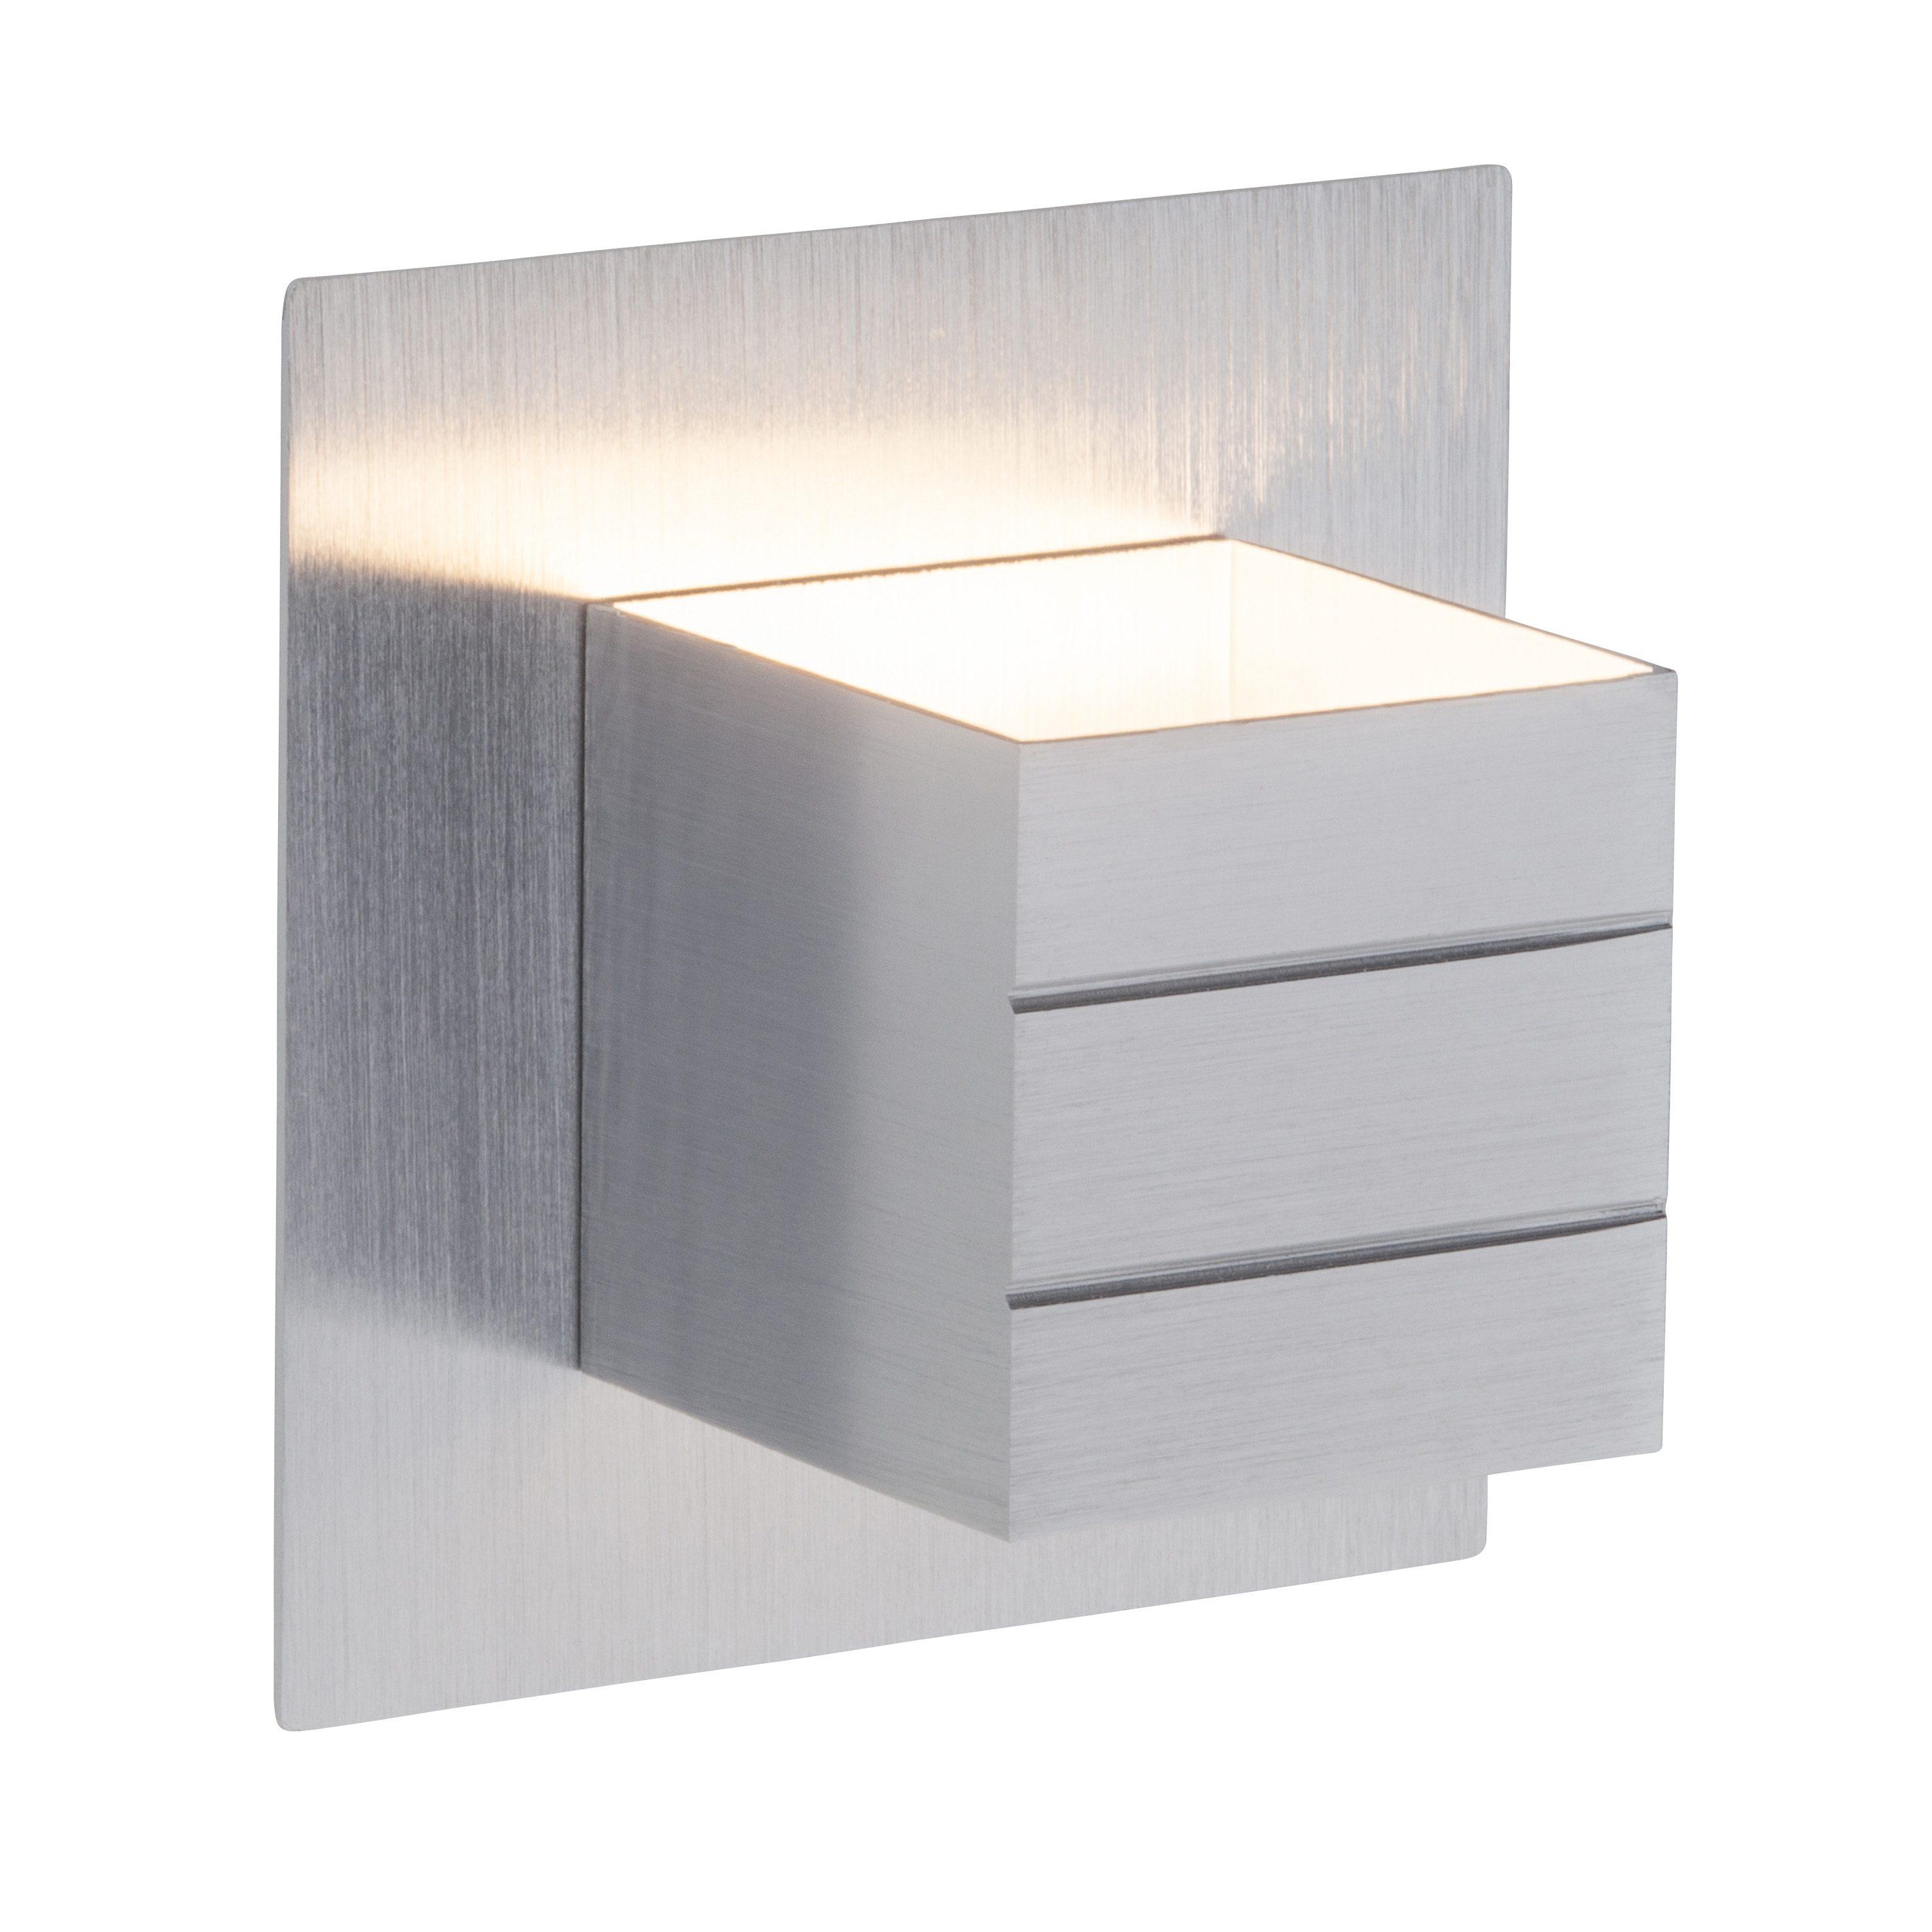 Brilliant Leuchten LED-Wandleuchte, inkl. LED-Leuchtmittel, 1 flammig